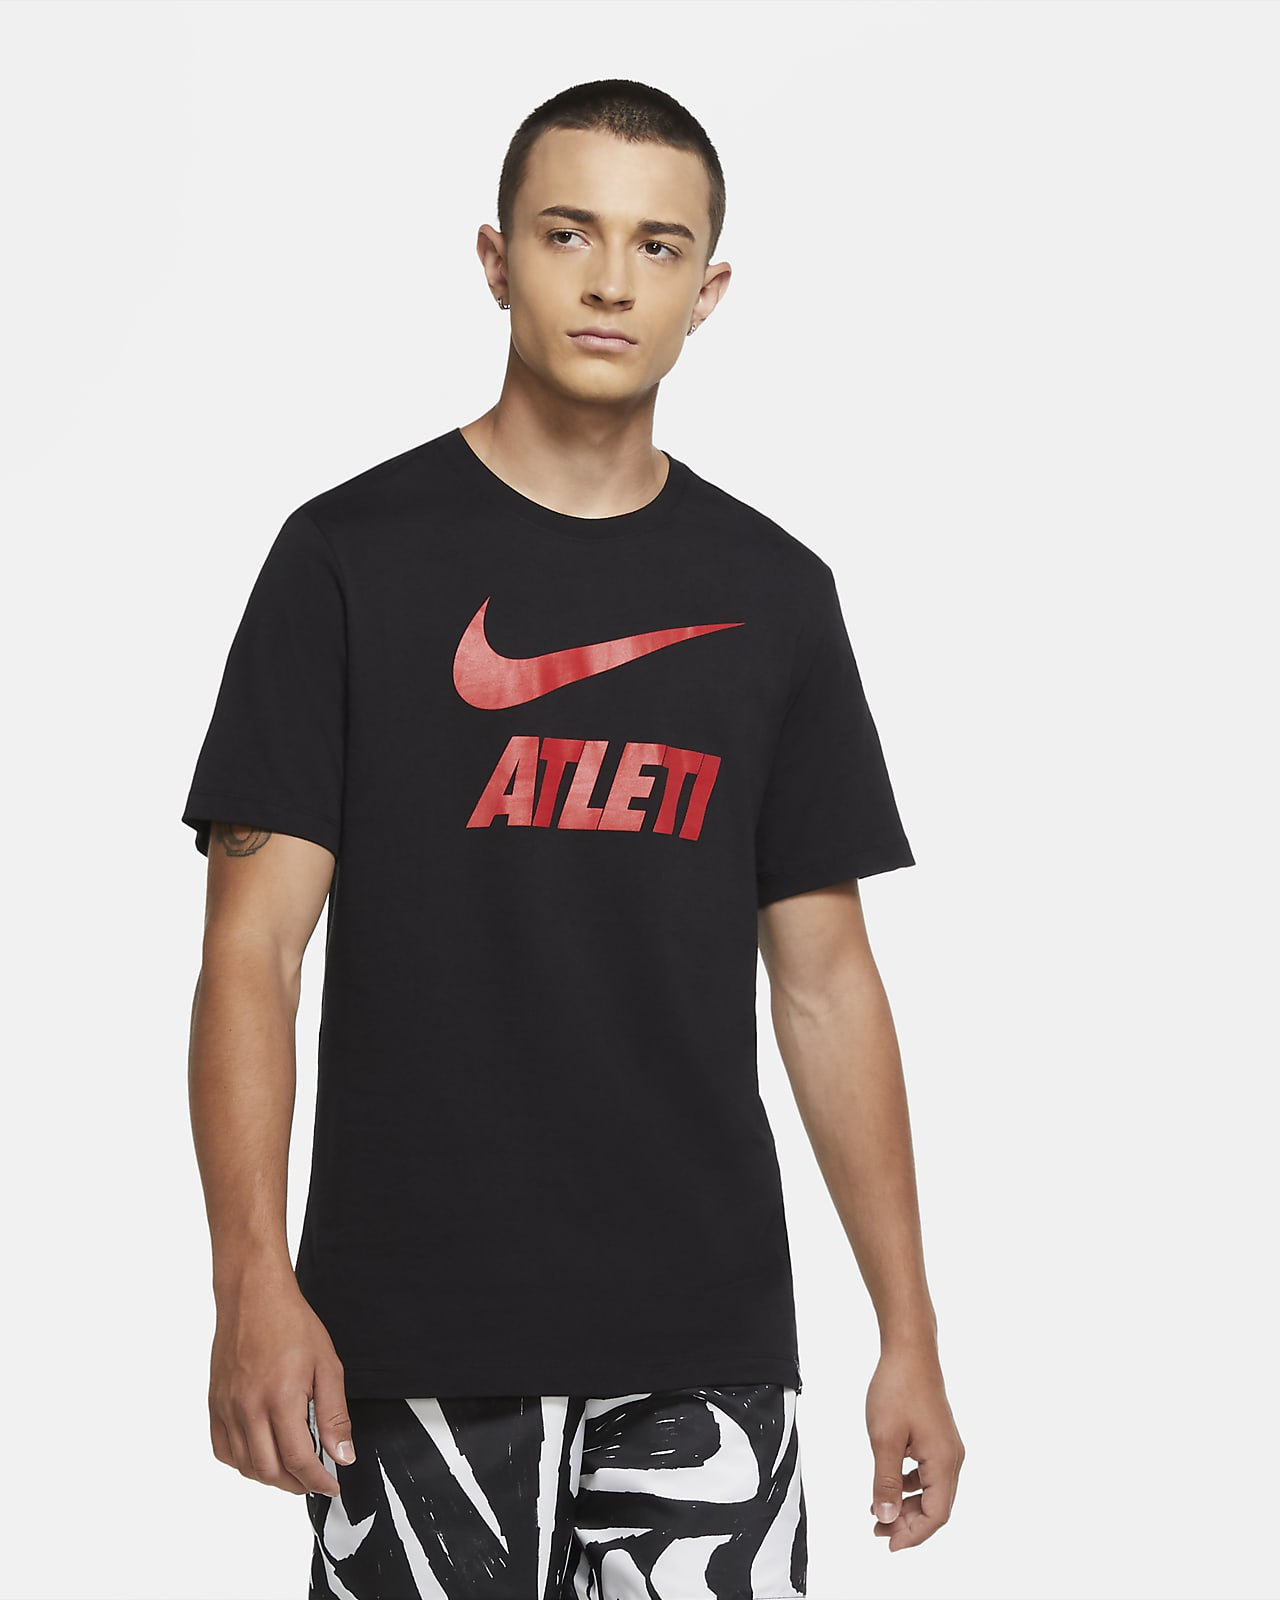 Atlético de Madrid Men's Football T-Shirt